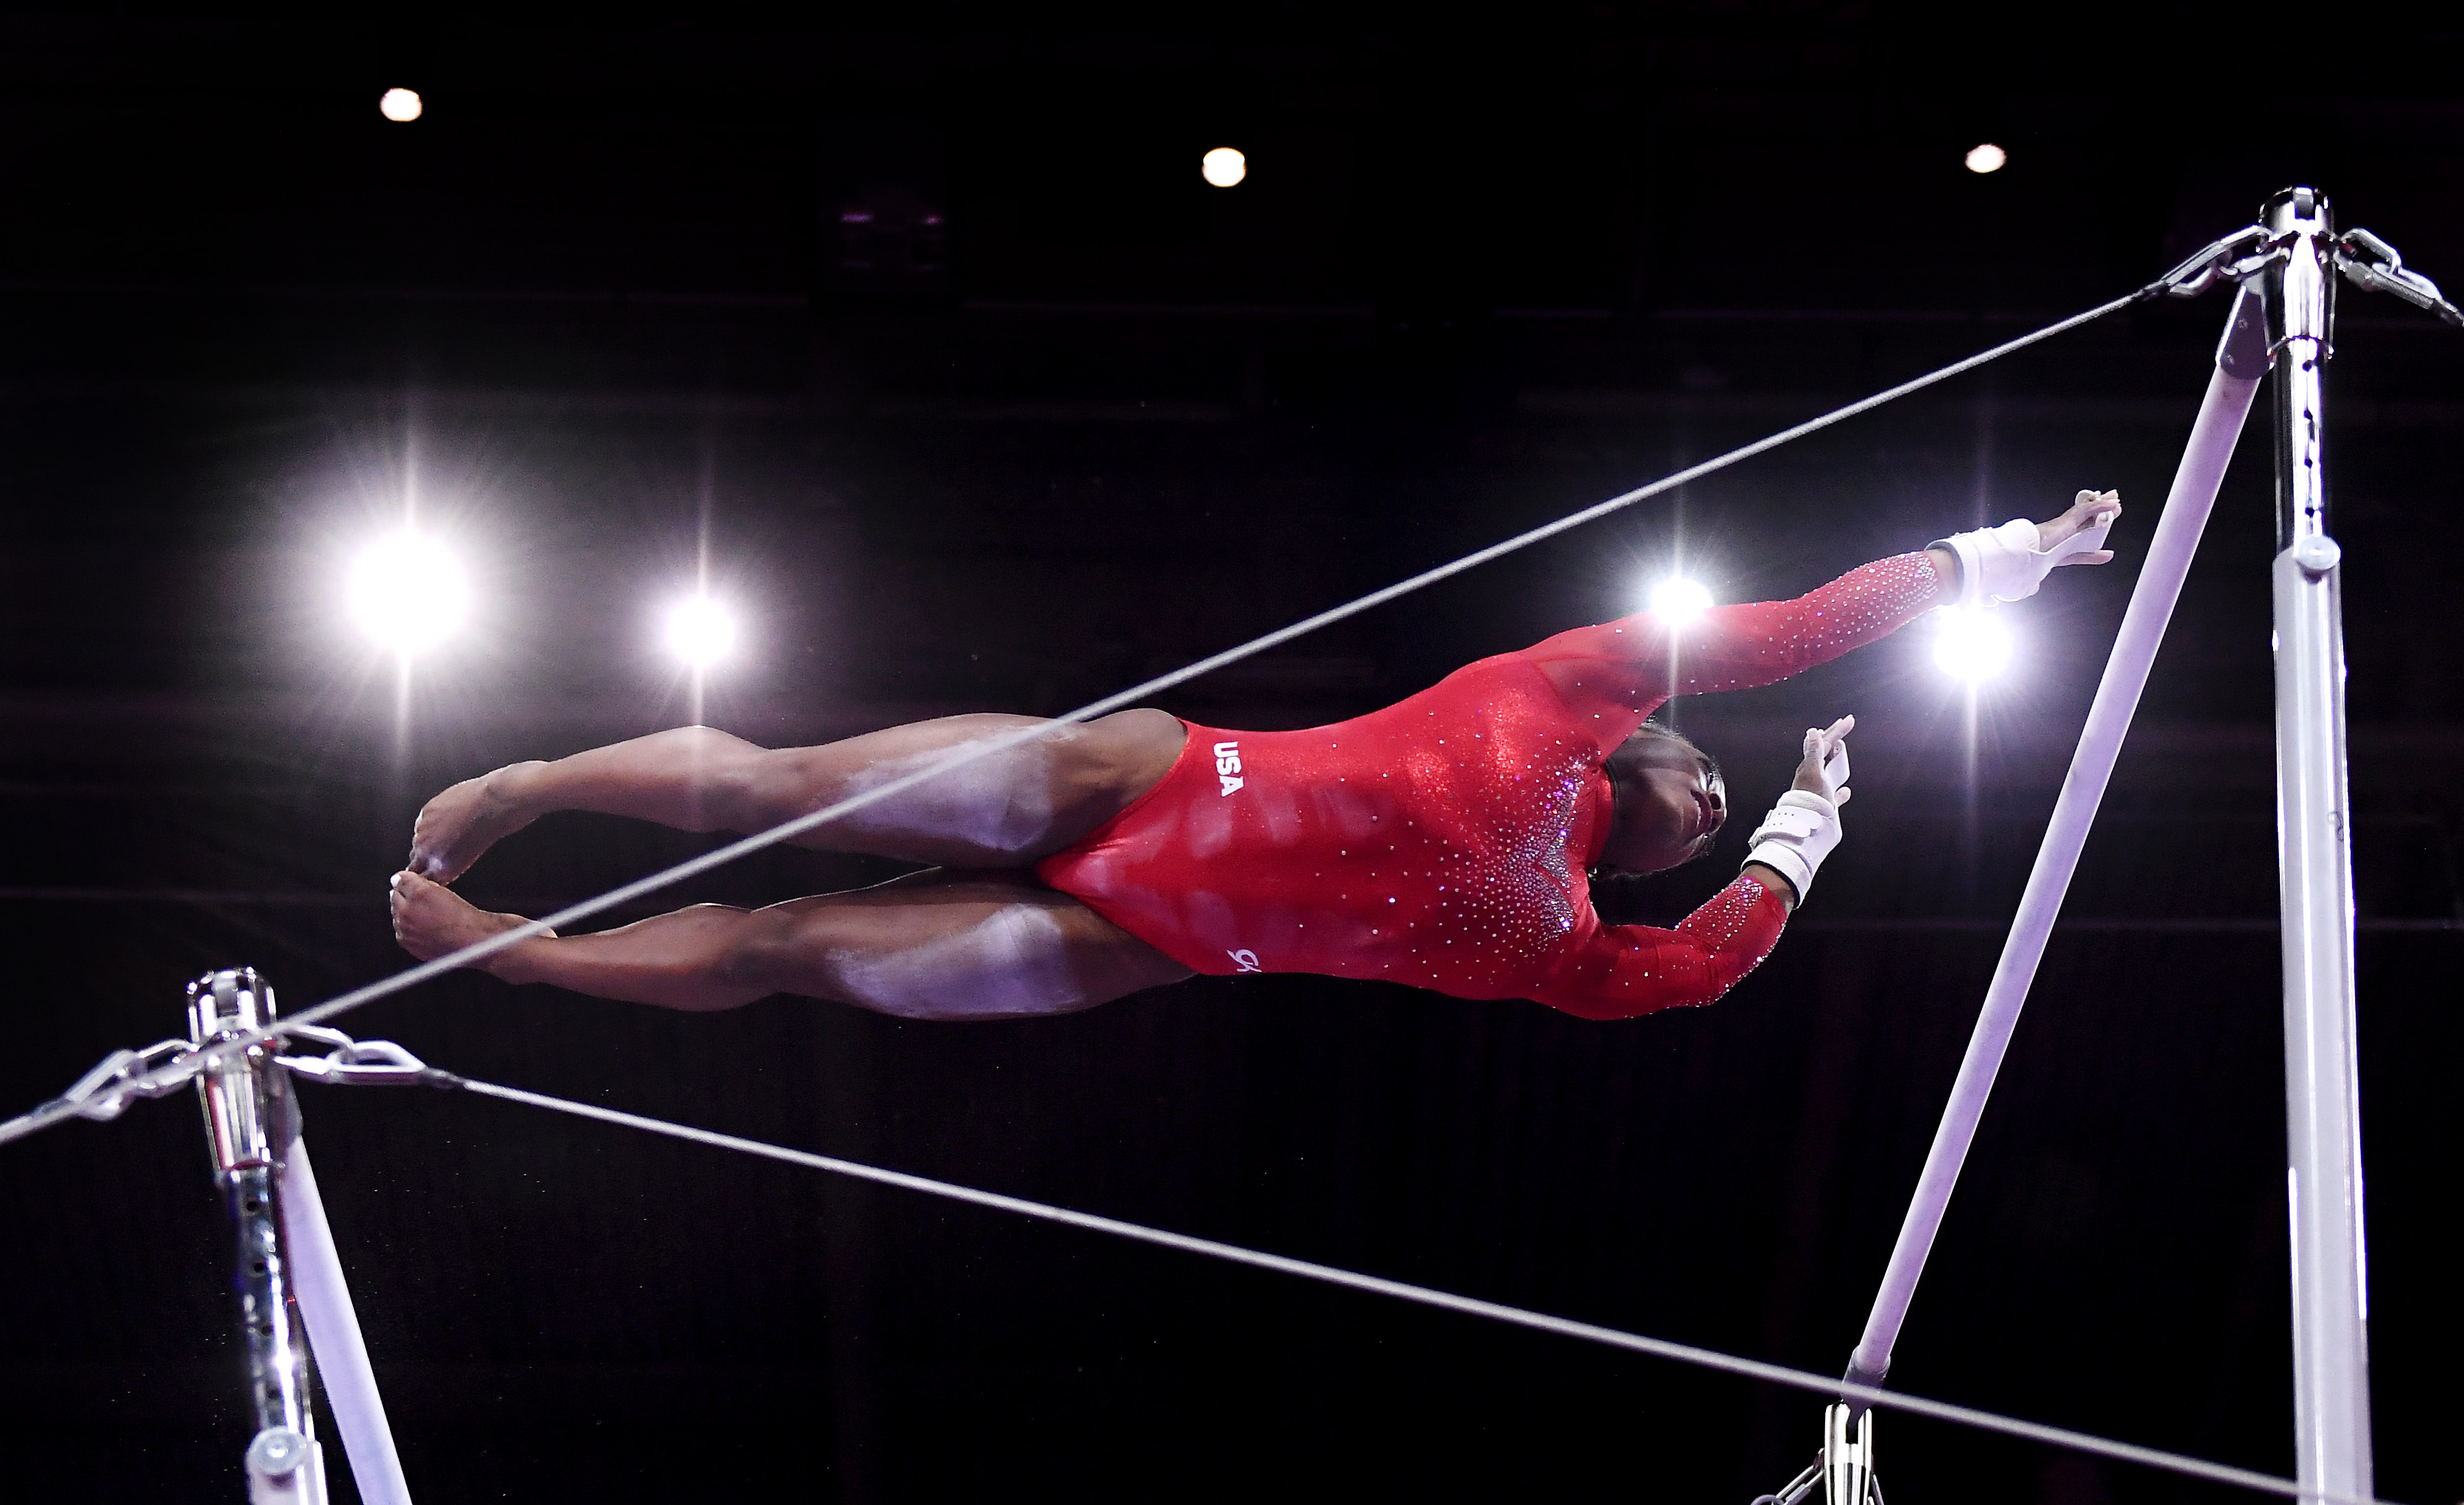 49th FIG Artistic Gymnastics World Championships - Day Nine